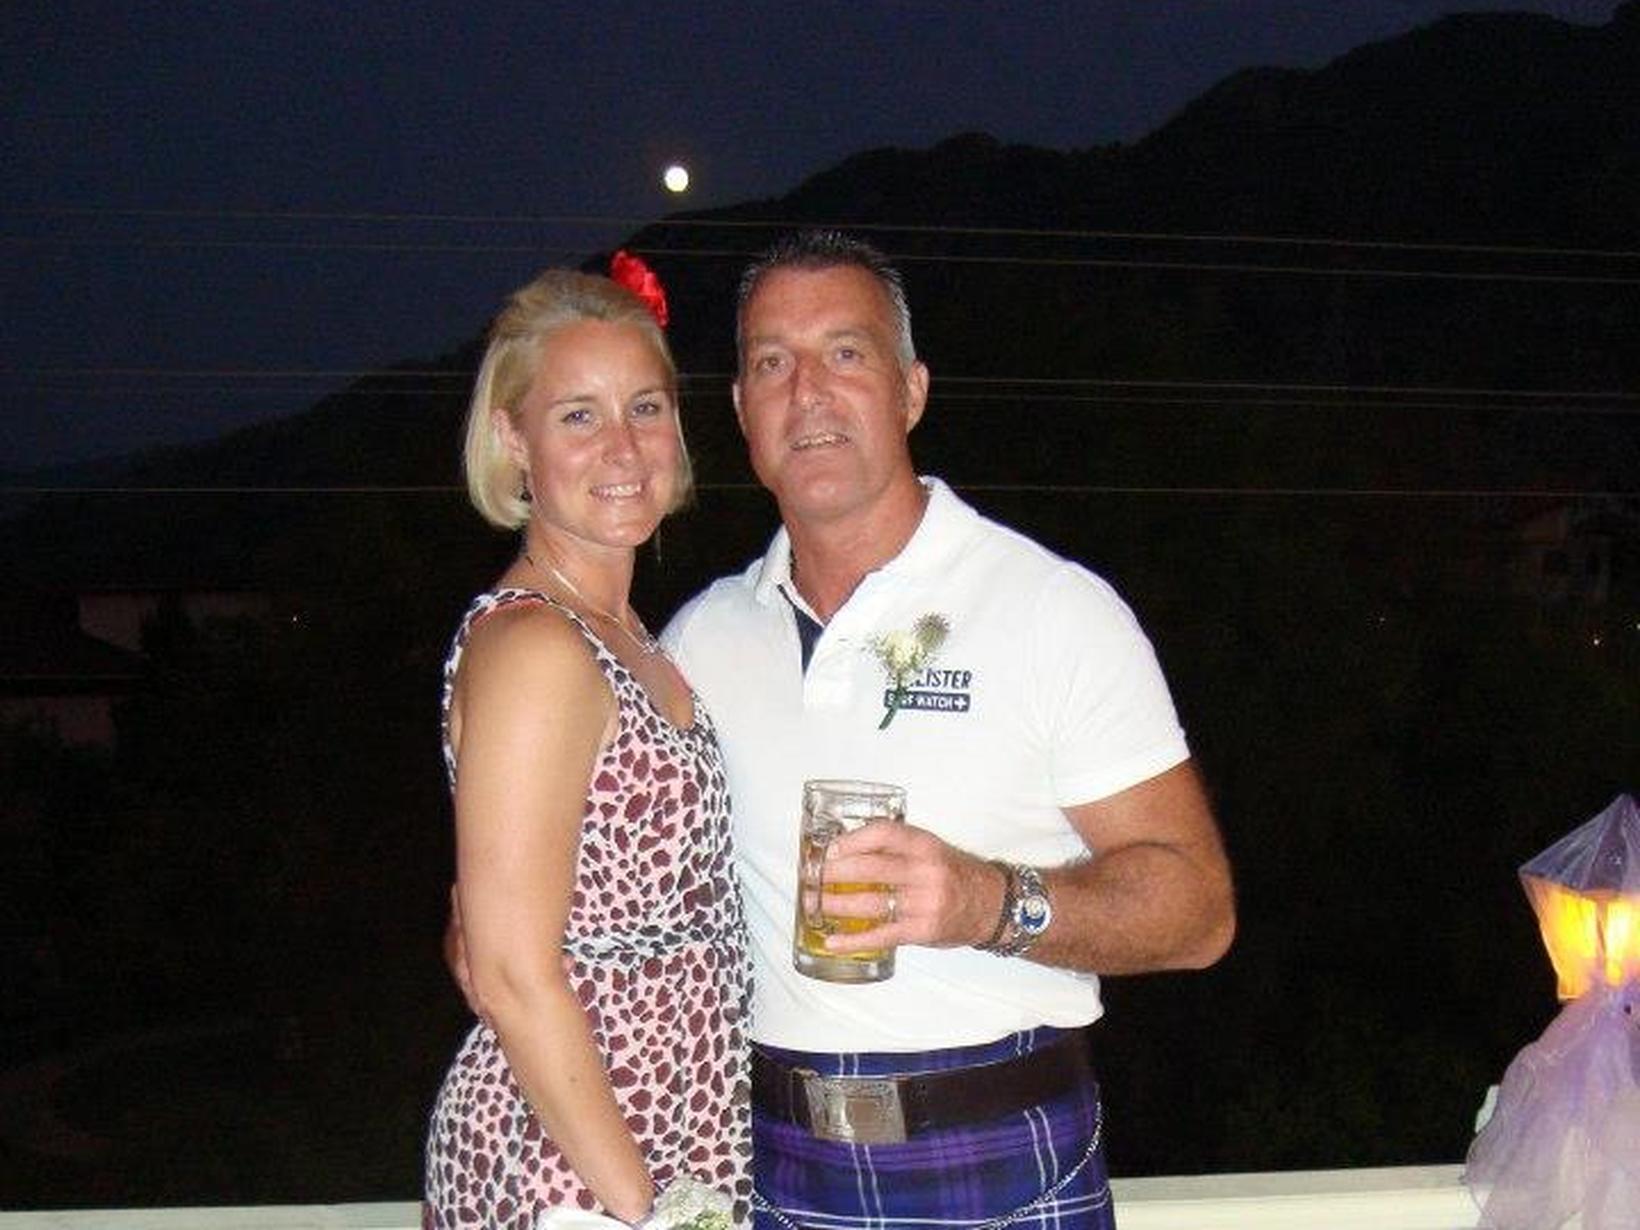 Cameron & Dani from Stratford-upon-Avon, United Kingdom